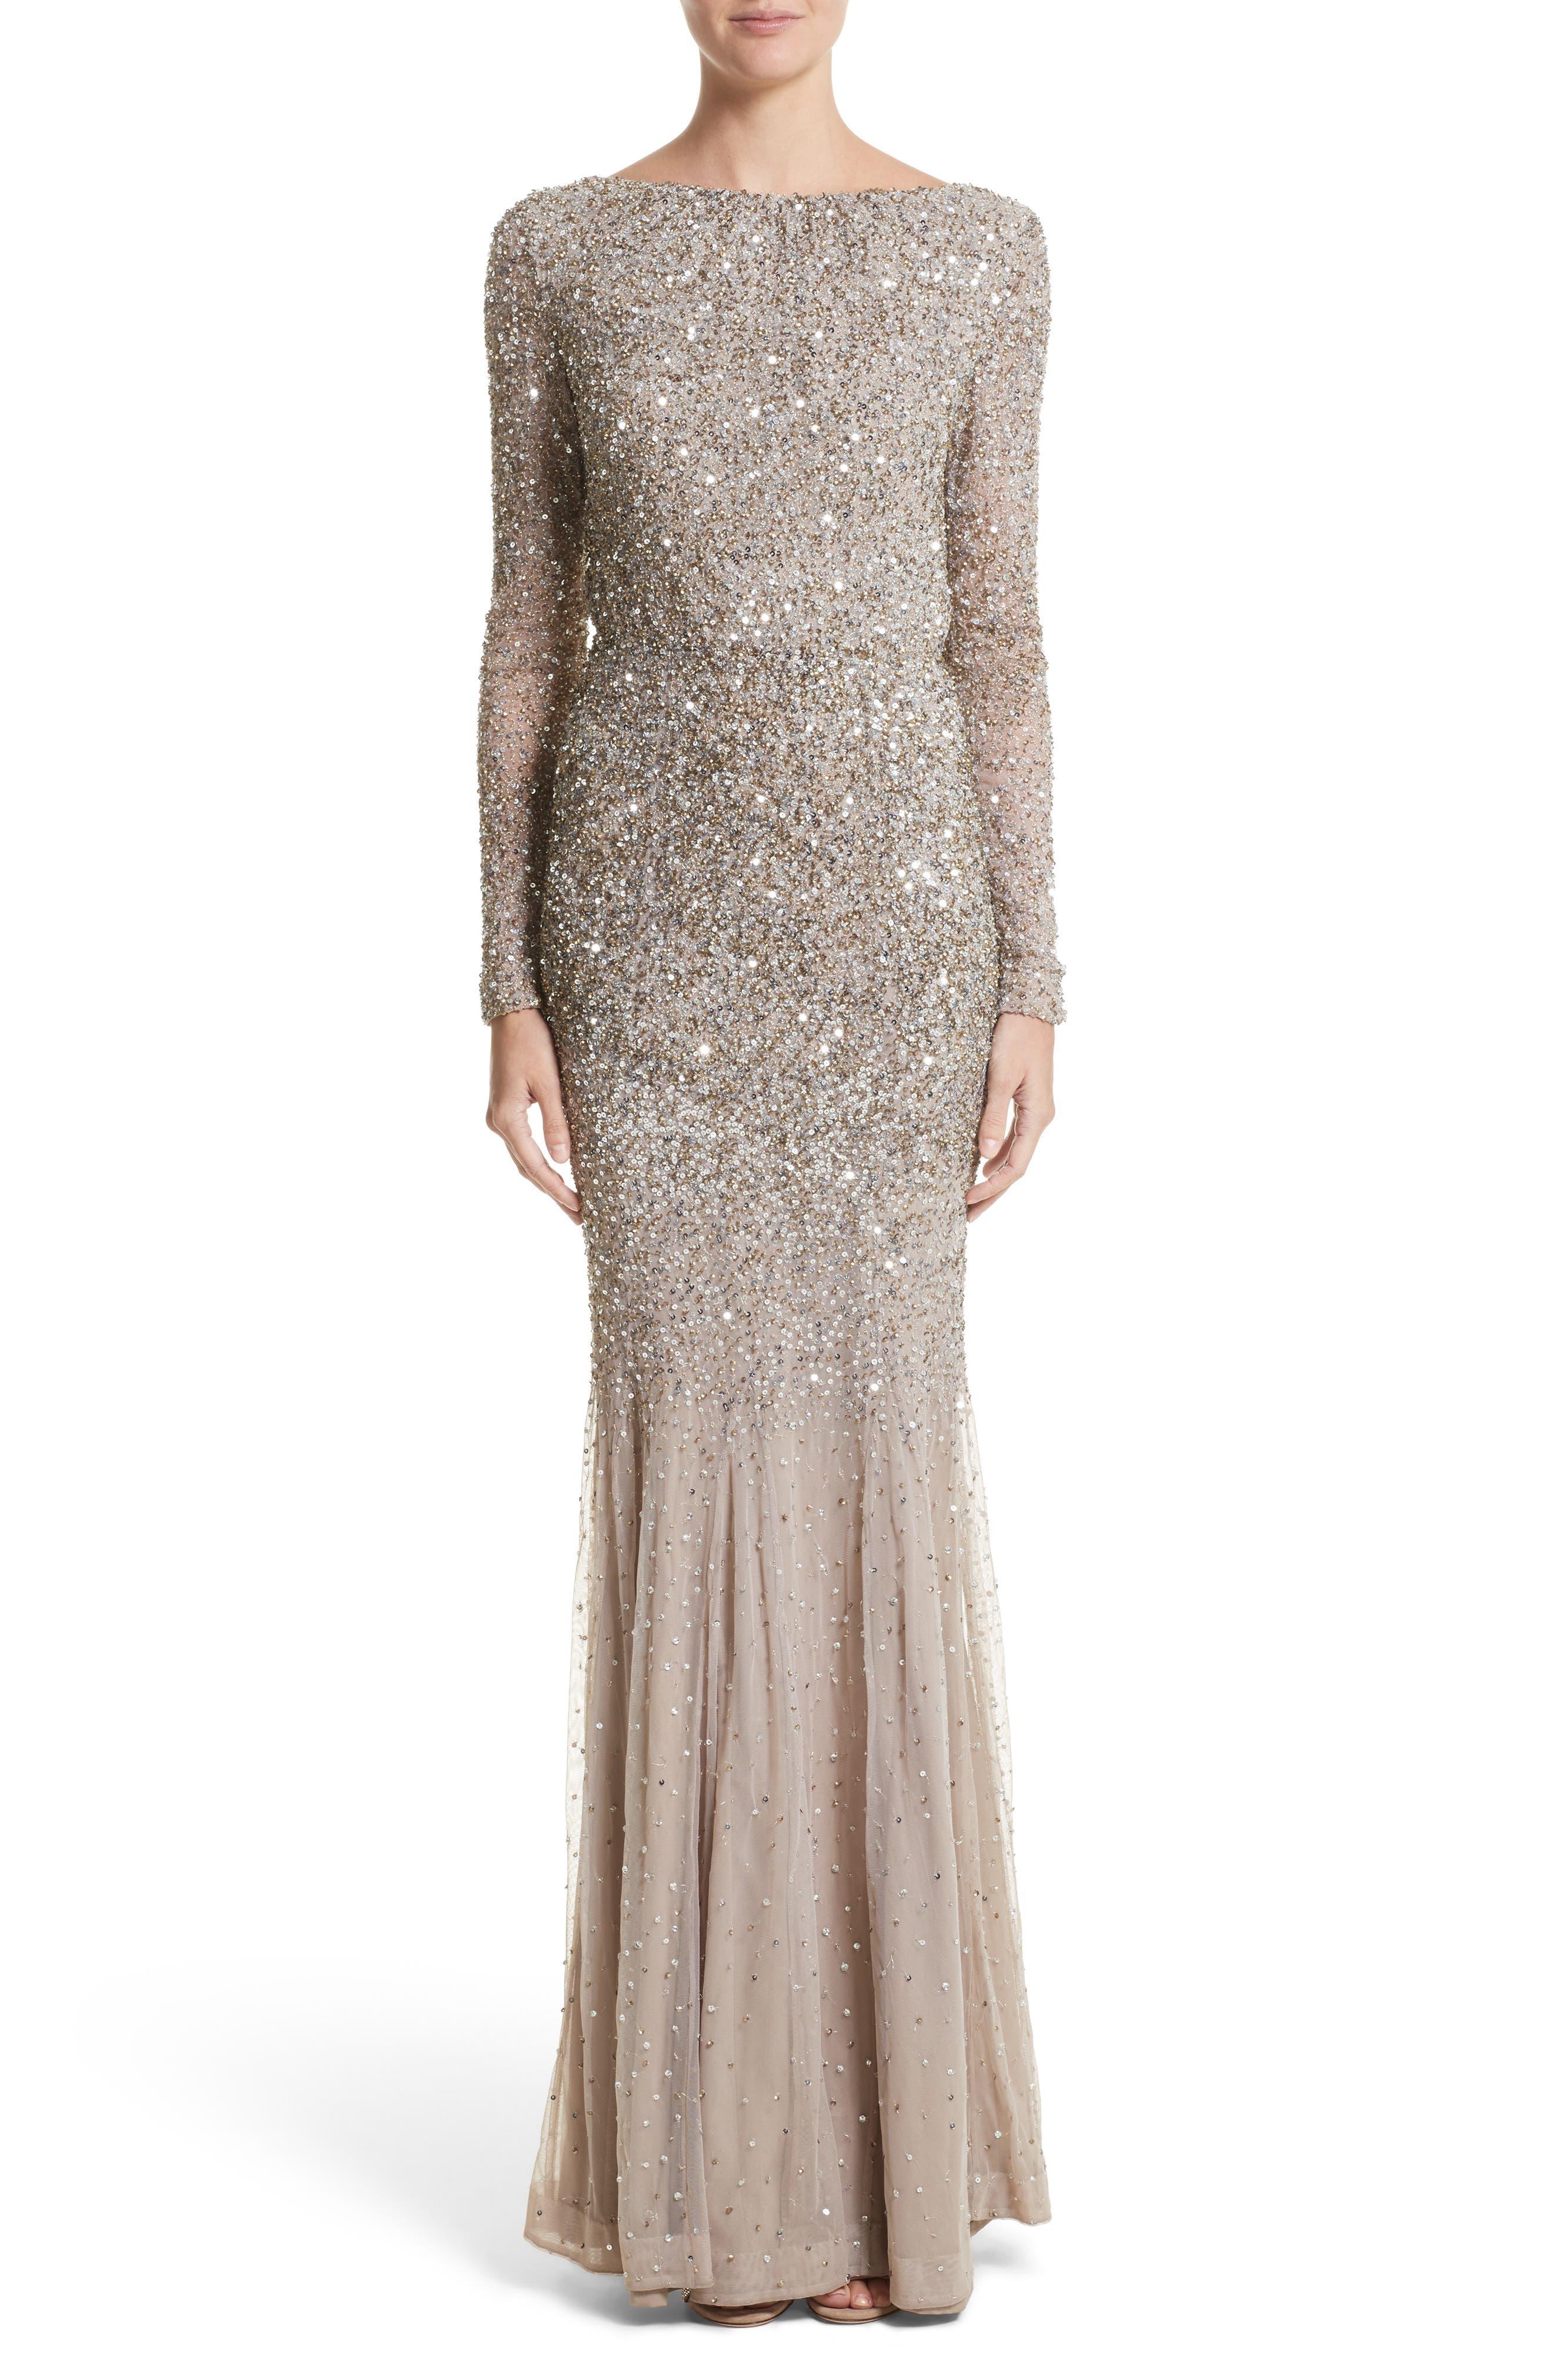 Alternate Image 1 Selected - Rachel Gilbert Viera Embellished V-Back Mermaid Gown